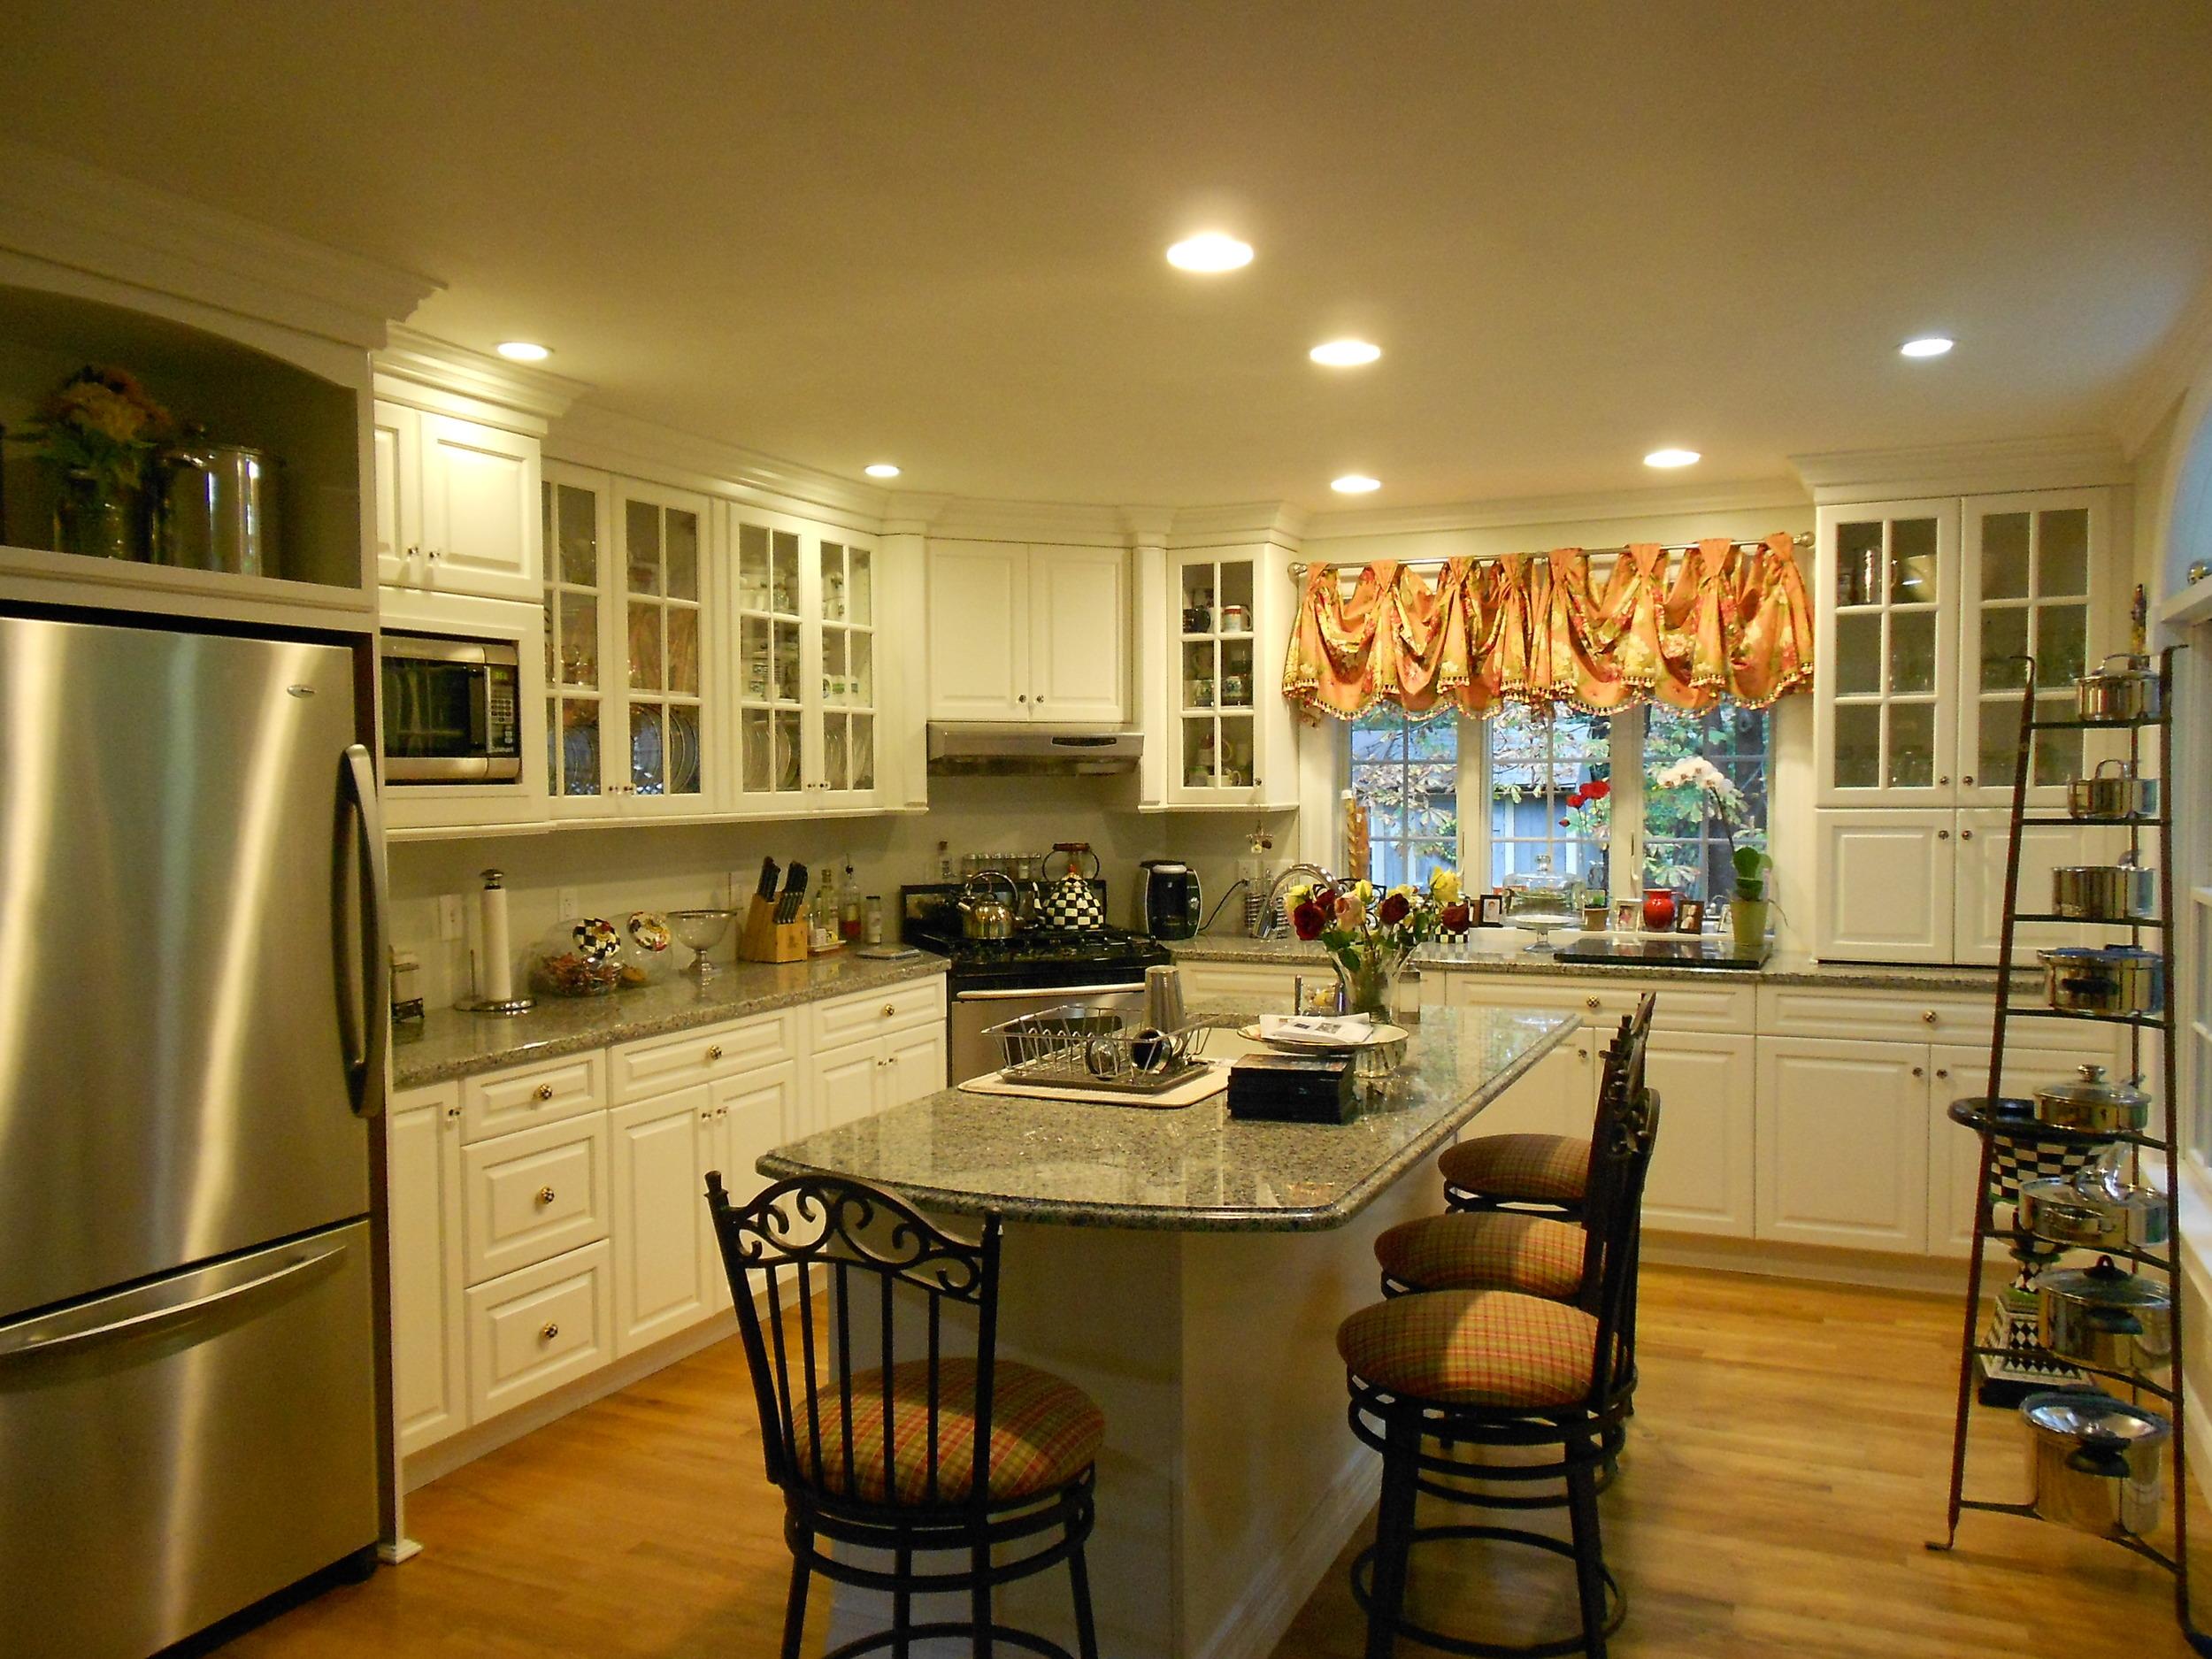 kitchen-remodel-24.jpg